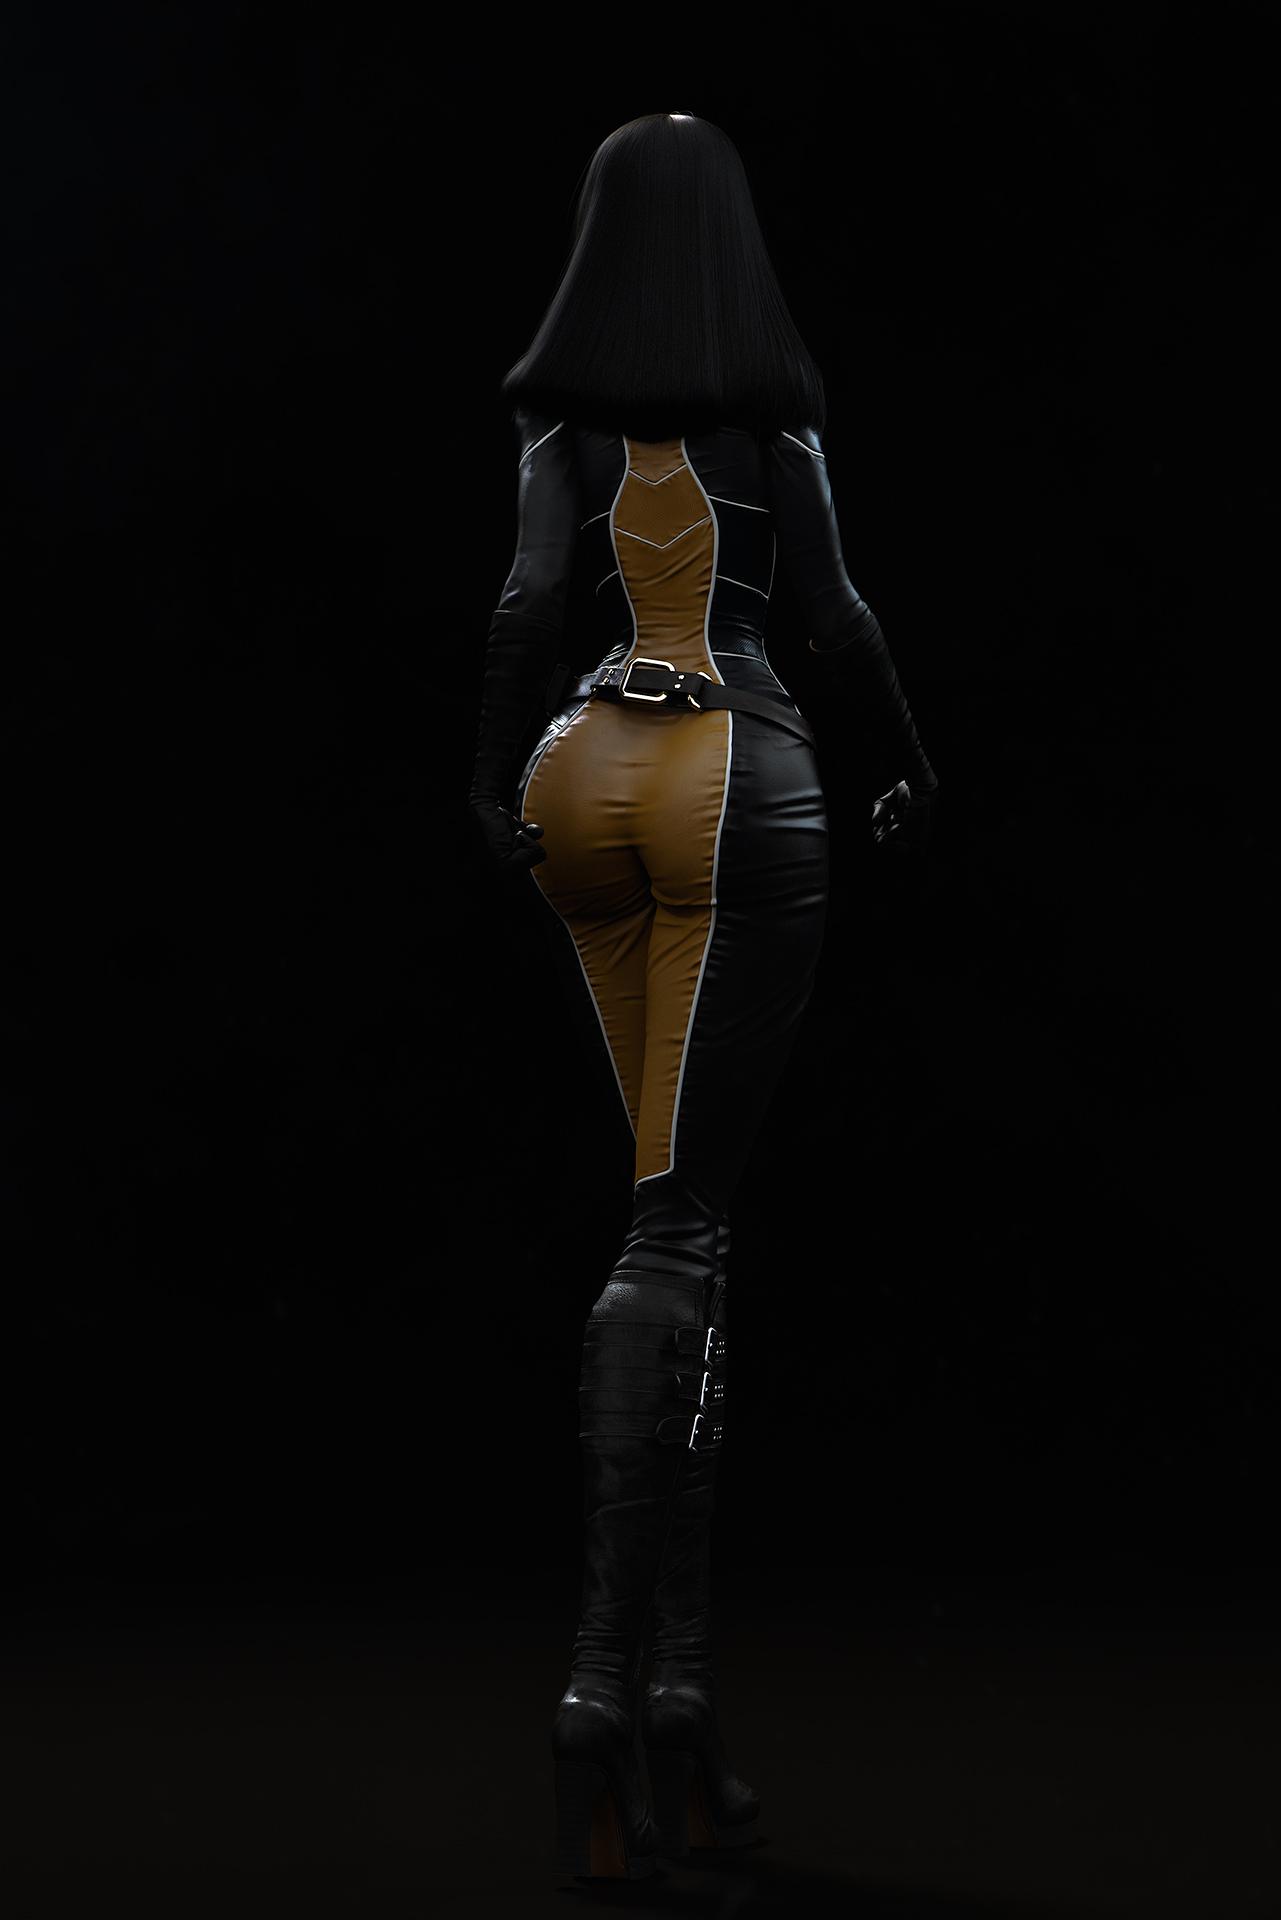 Fireproof - character modeling and design from artist concept - epic studios kenya 3D design and 3D Animation Kenya